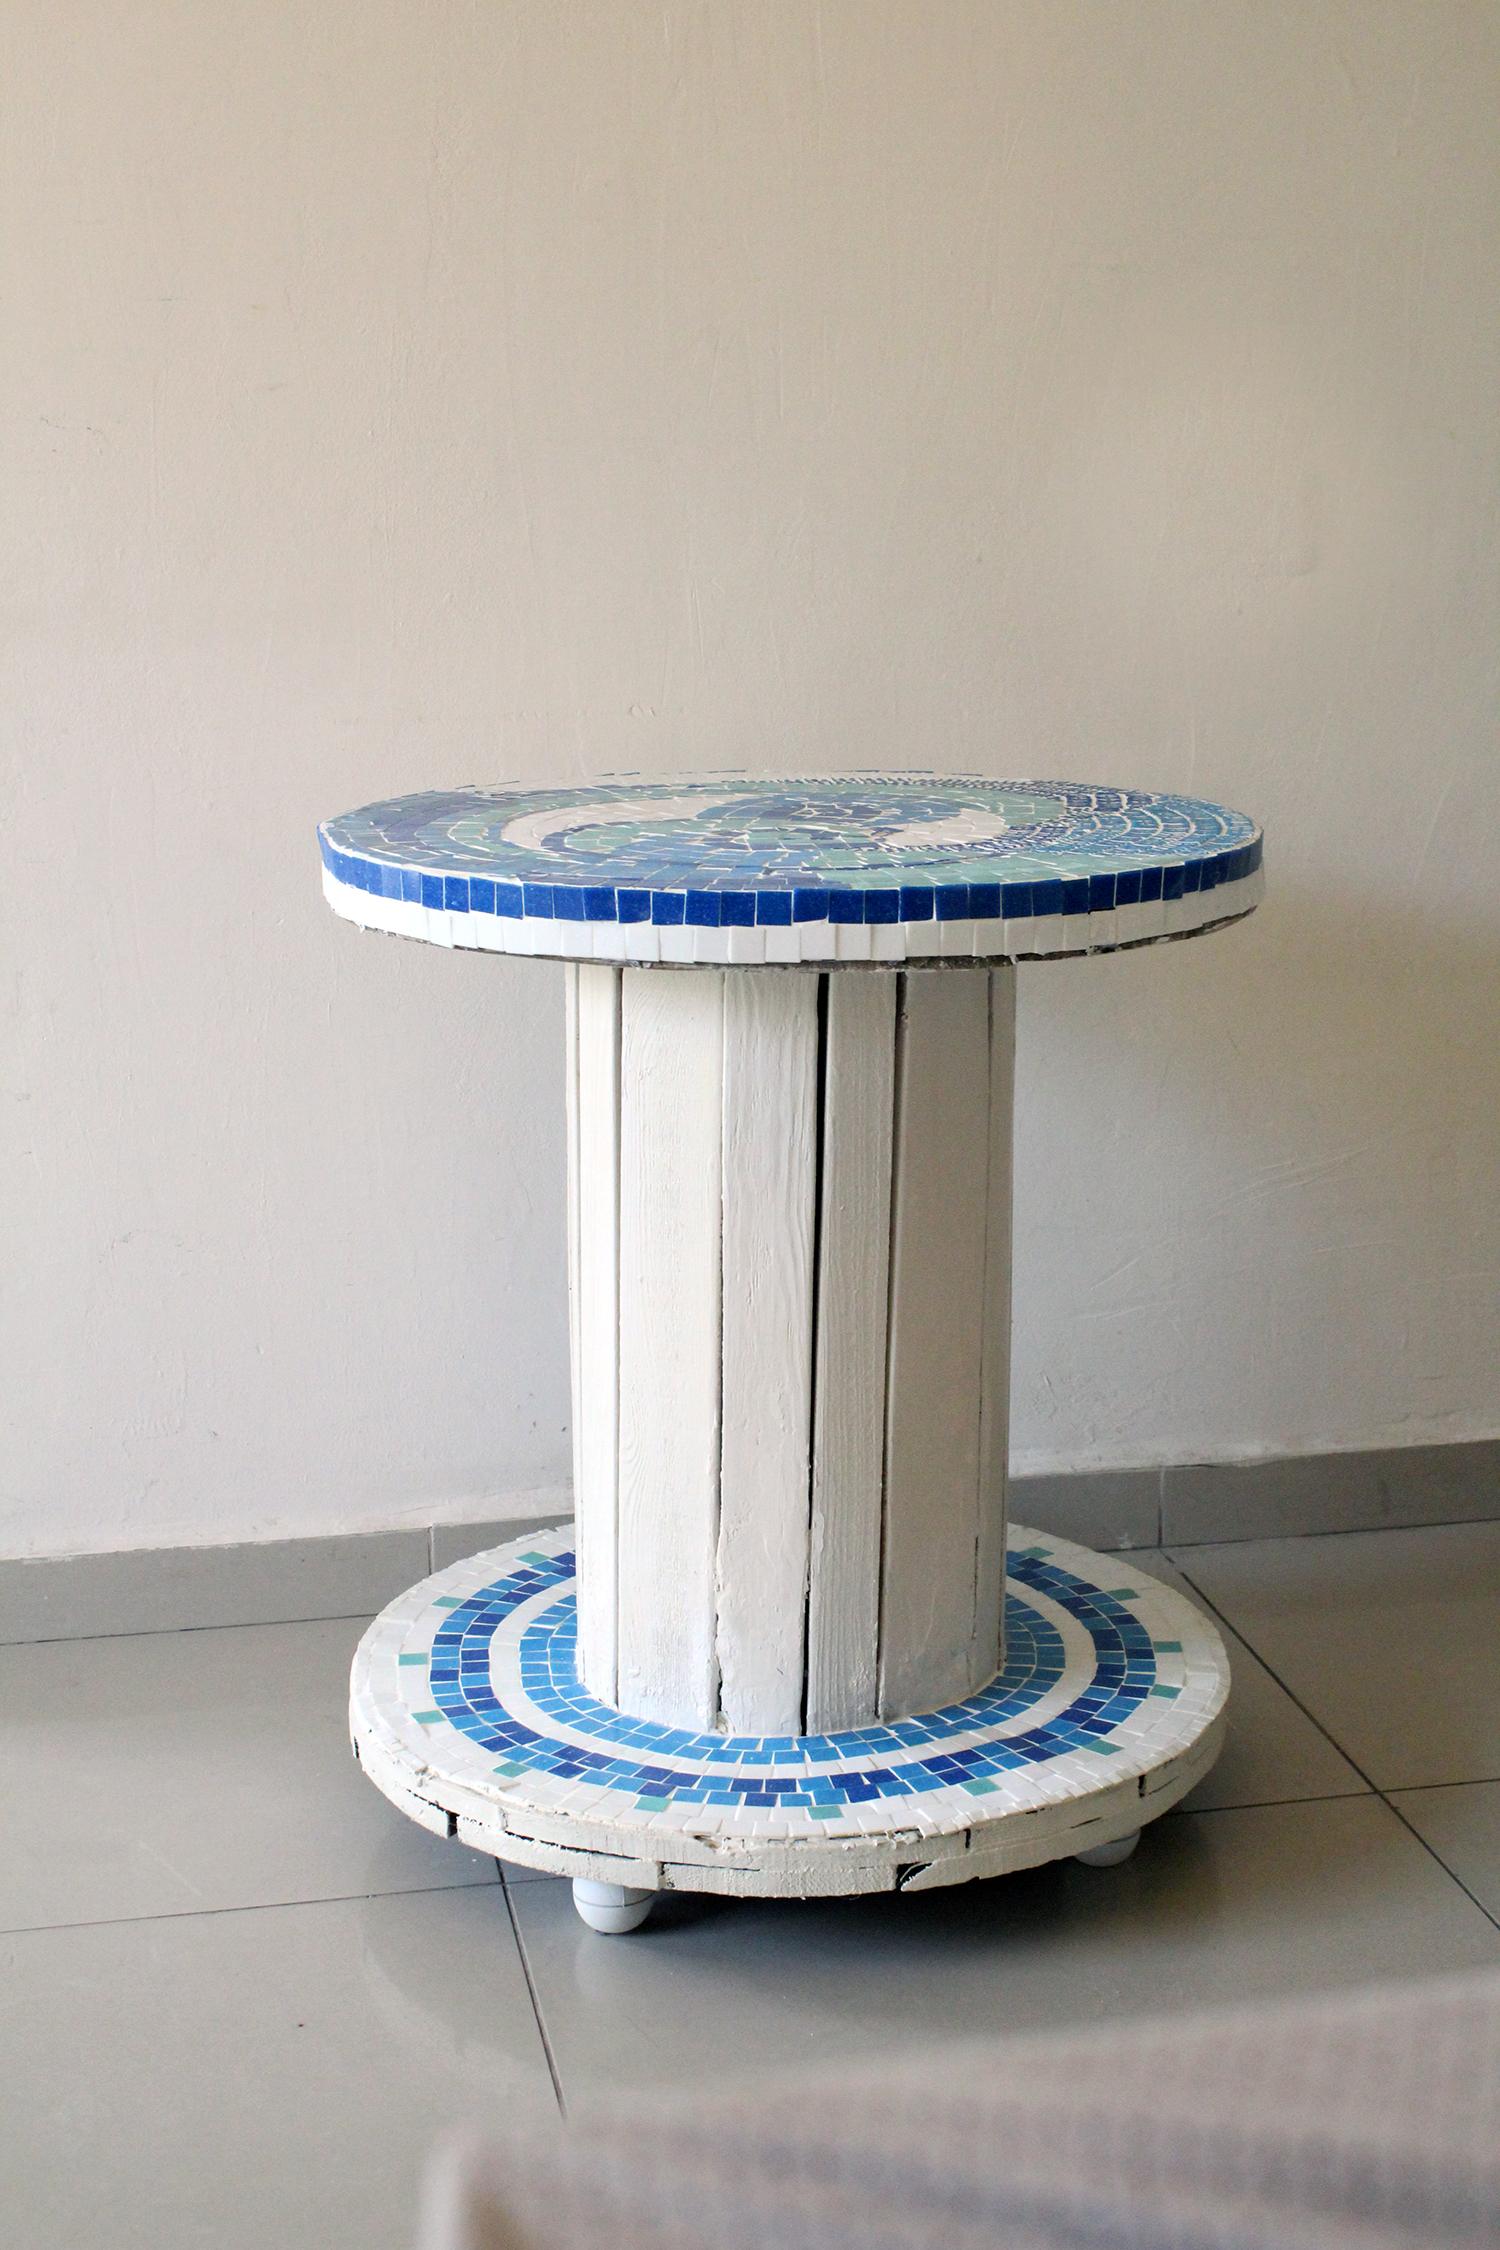 IMG 7446 - שולחן פסיפס מסליל חשמל